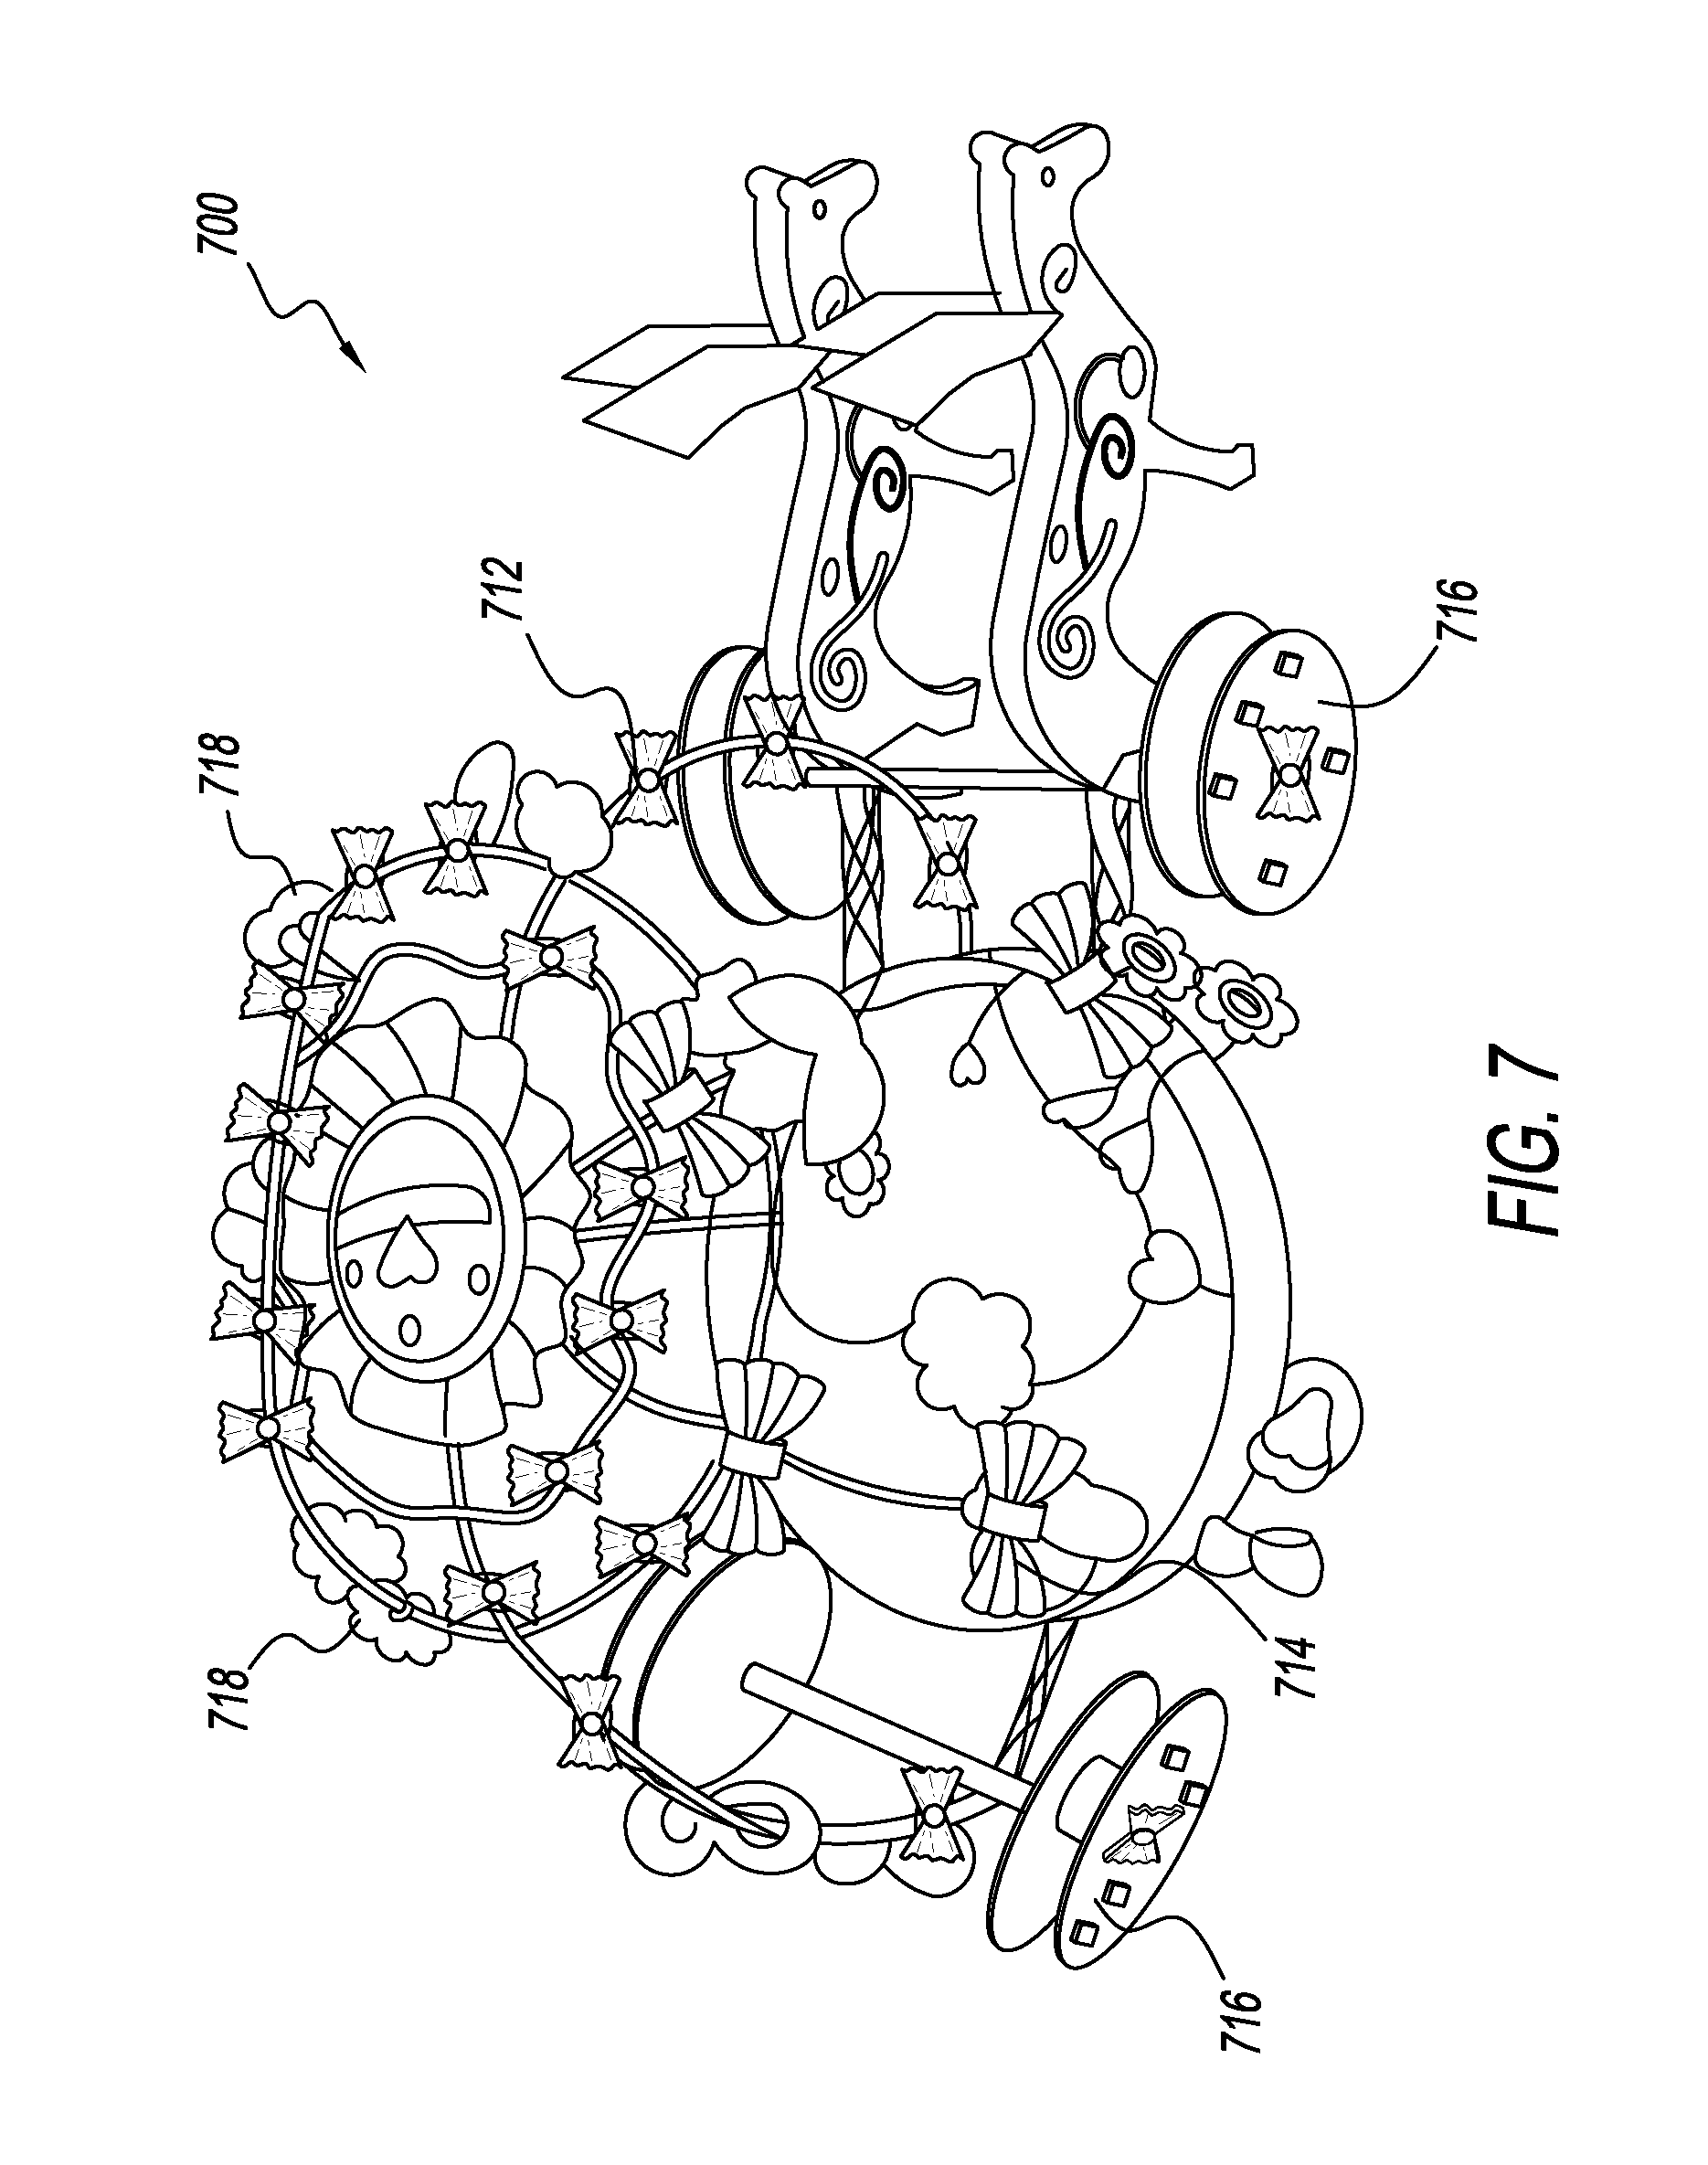 2006 Toyota Rav4 Parts Diagram Starter Html